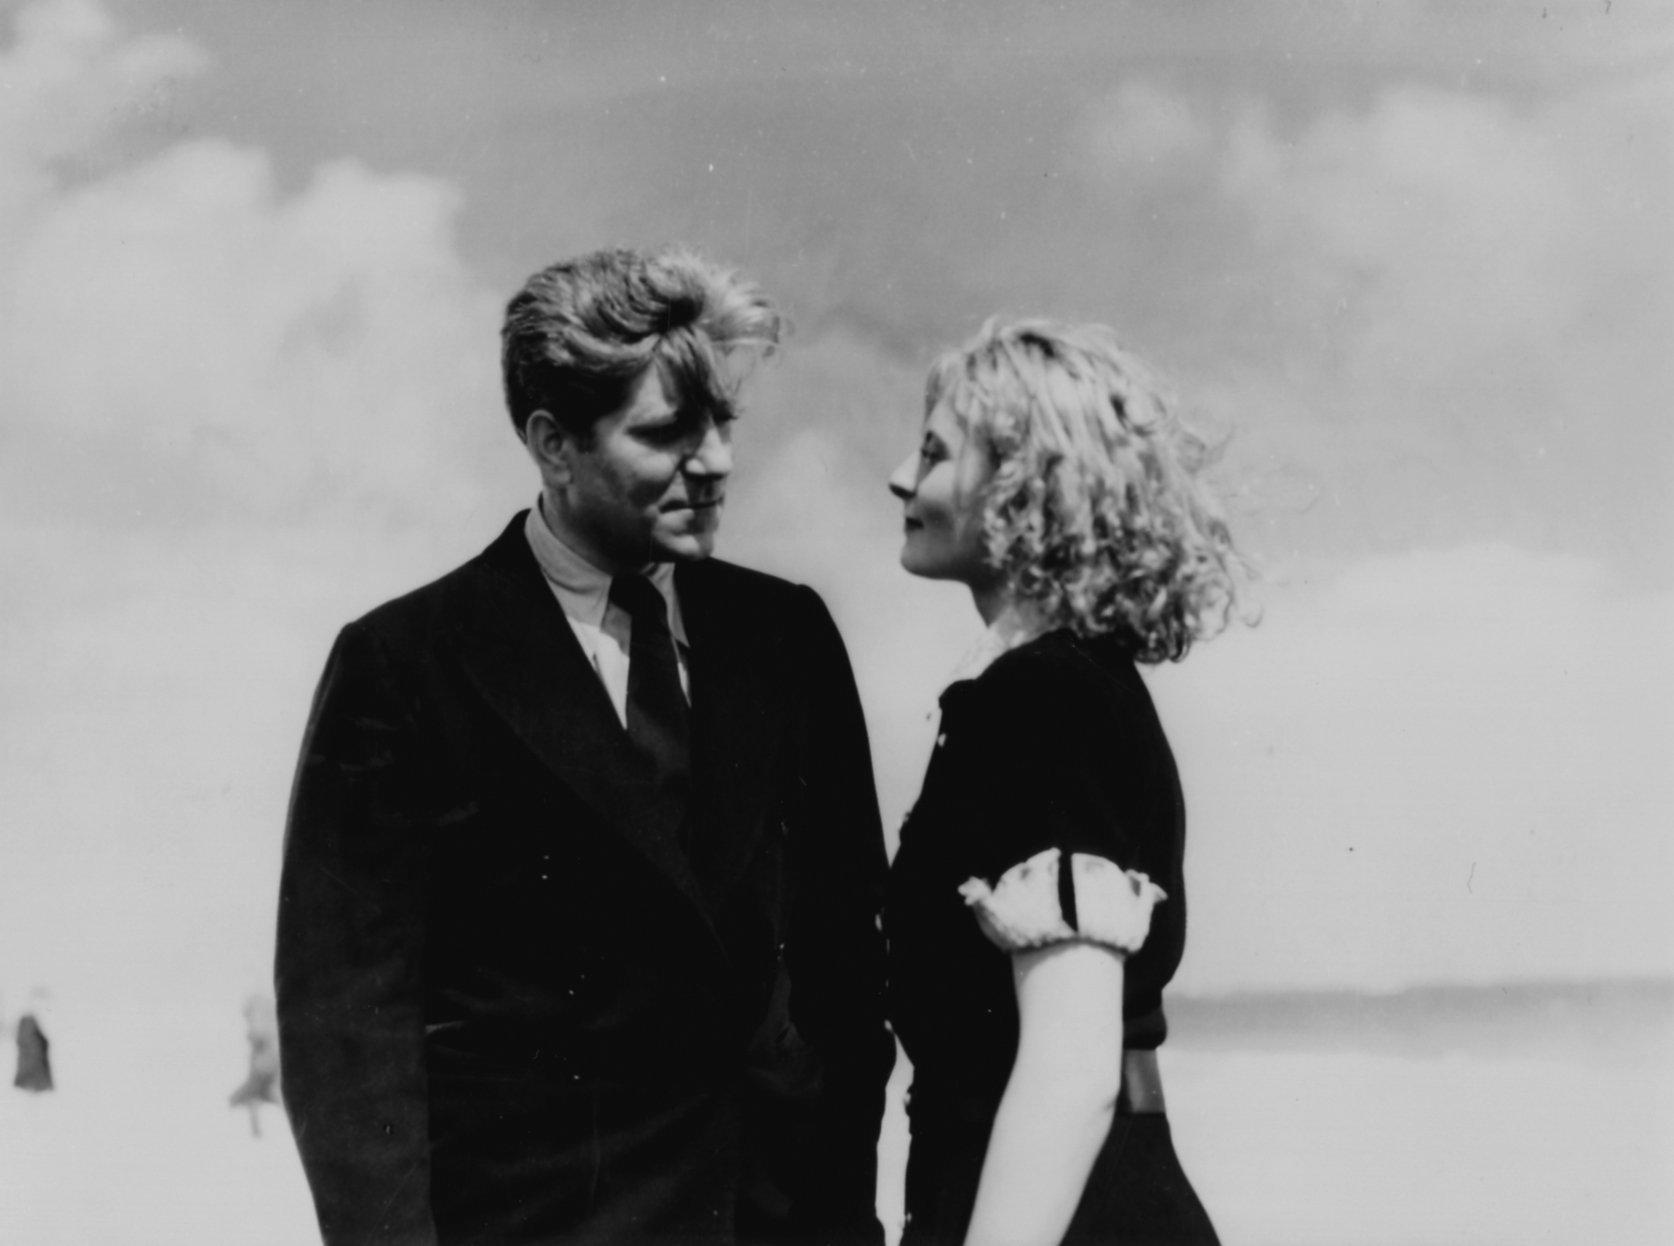 Michèle Morgan and Jean Gabin in Remorques (1941)